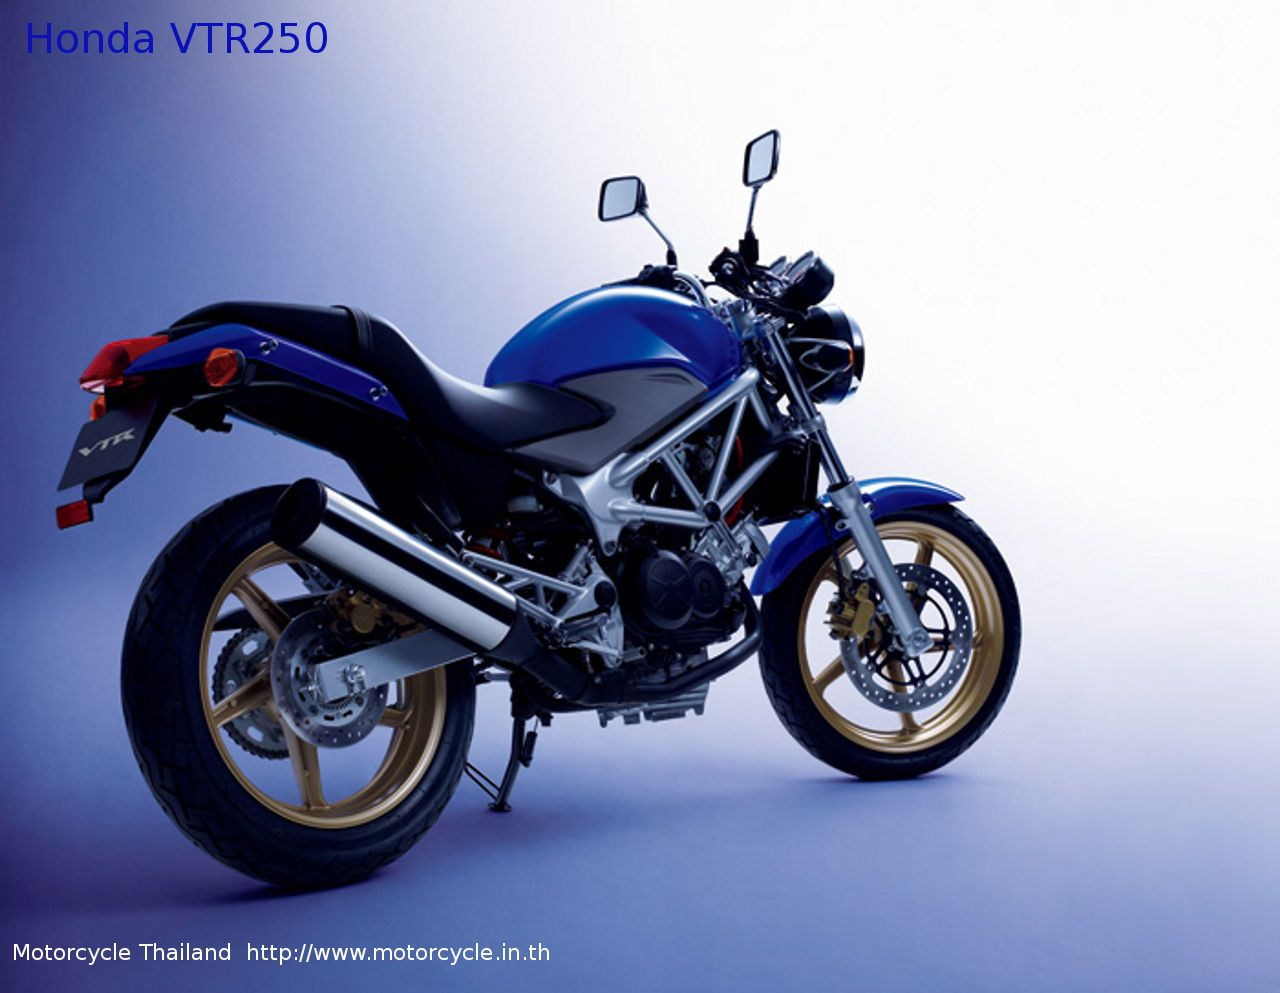 http popgun ru files g 160 orig 2643712 jpg bike pinterest rh pinterest com Honda 150 Motorcycle Thailand Triumph Motorcycle Factory Thailand